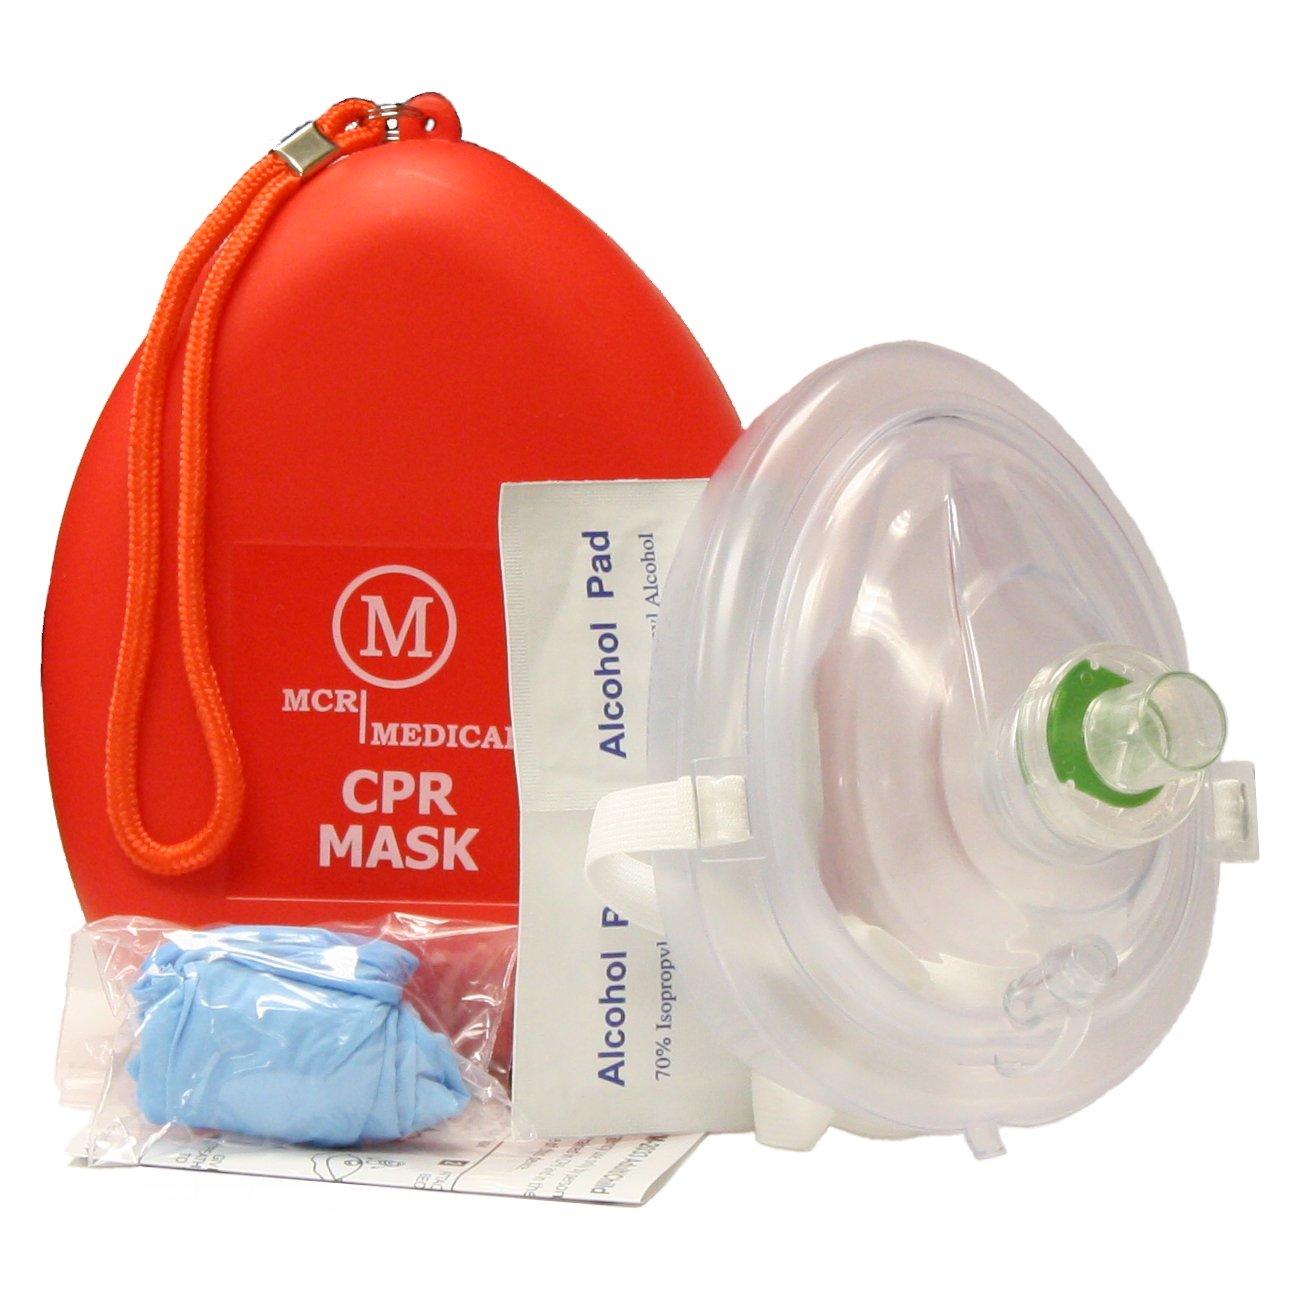 MCR Medical CPR Rescue Mask, Adult/Child Pocket Resuscitator, Hard Case with Wrist Strap